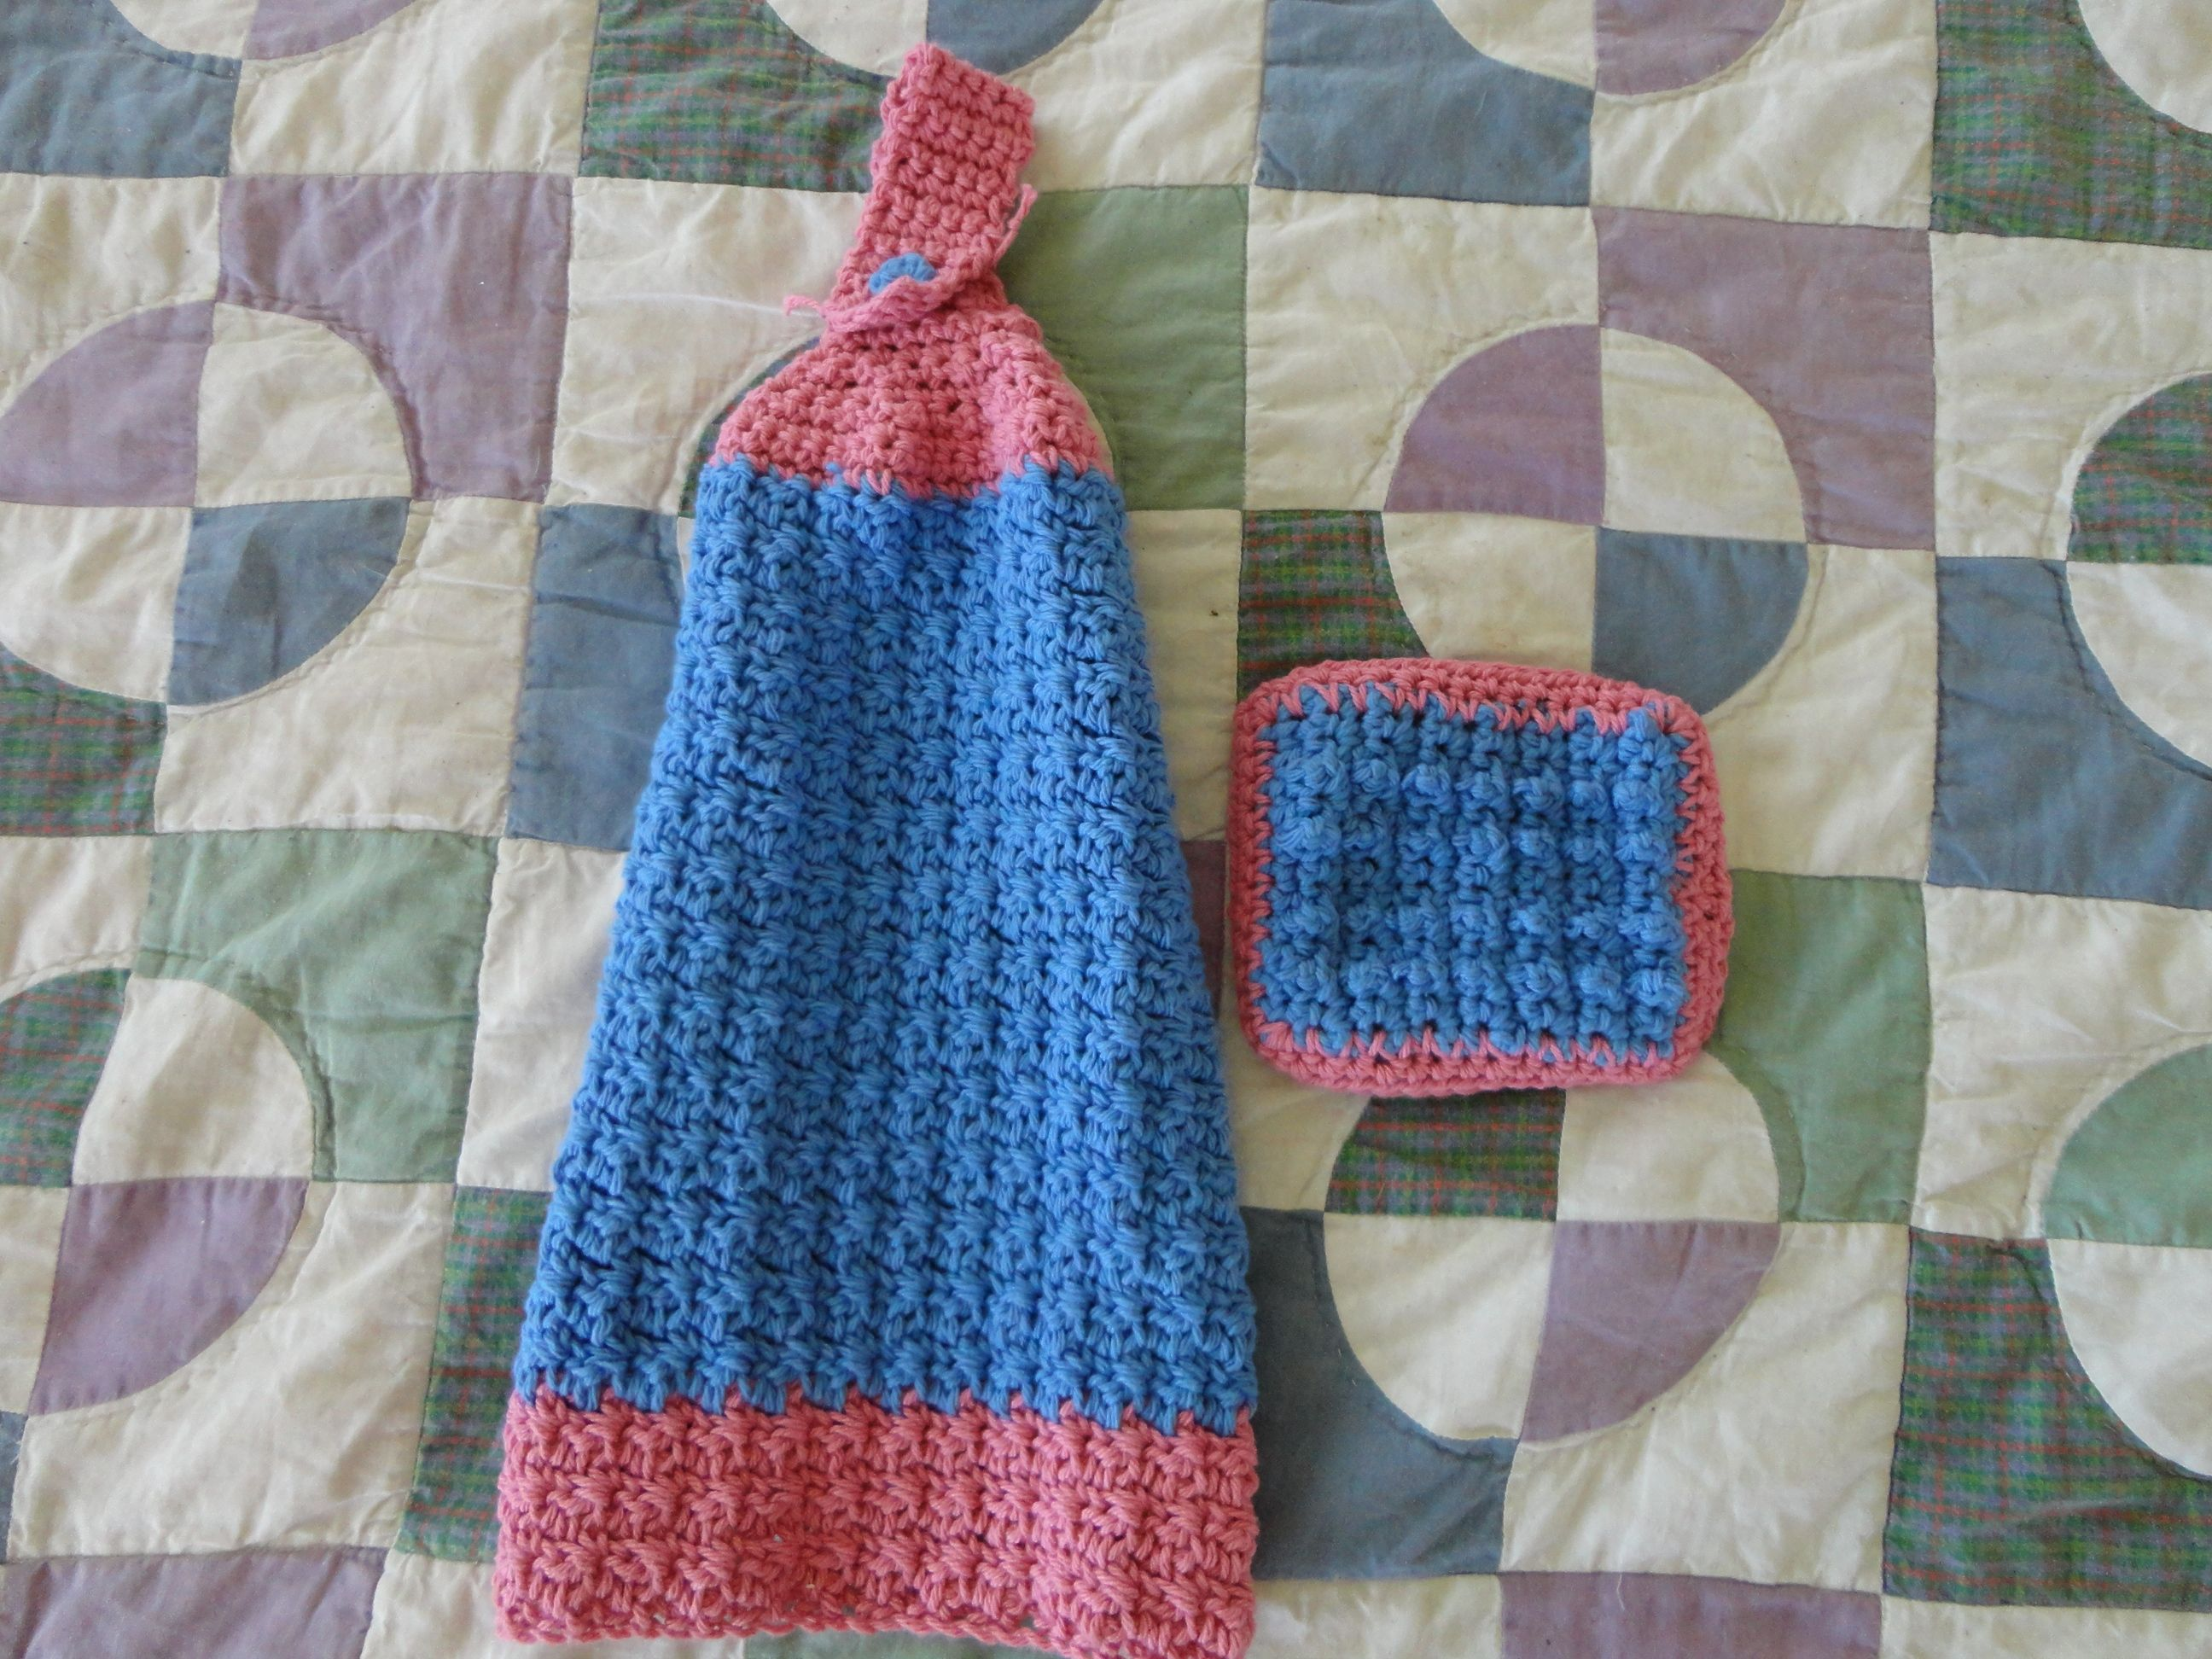 Crocheting Dish Towels : Crochet Kitchen towel and sponge crochet Pinterest